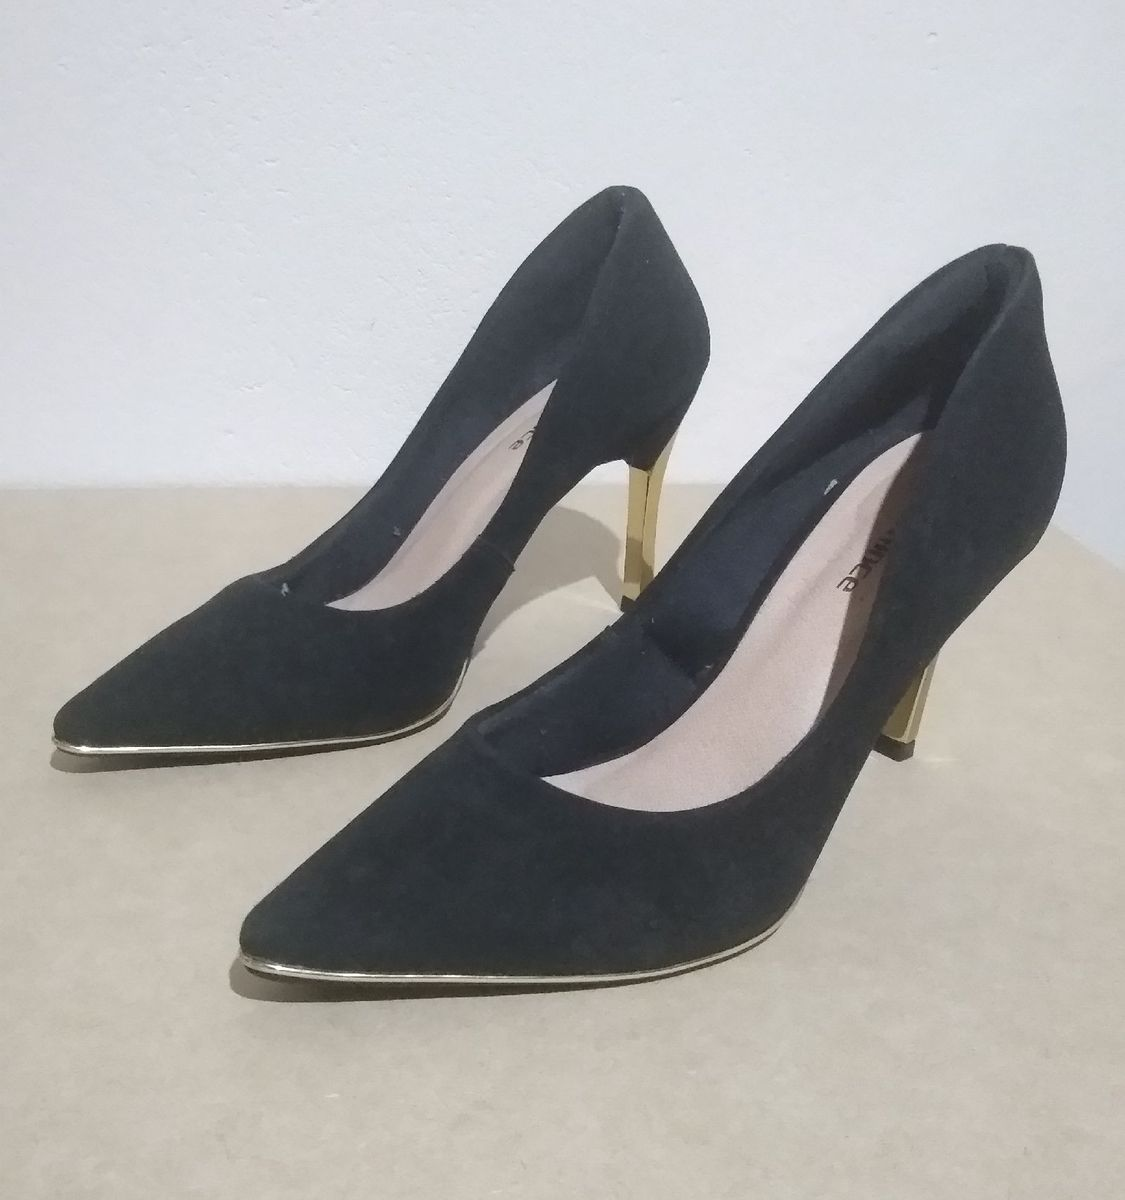 85ee77b91f scarpin preto - sapatos constance.  Czm6ly9wag90b3muzw5qb2vplmnvbs5ici9wcm9kdwn0cy8xmte3njkvntawzjg4ngmwnju0ntc3otlhnwq3ztcznwjhnmy4ndguanbn